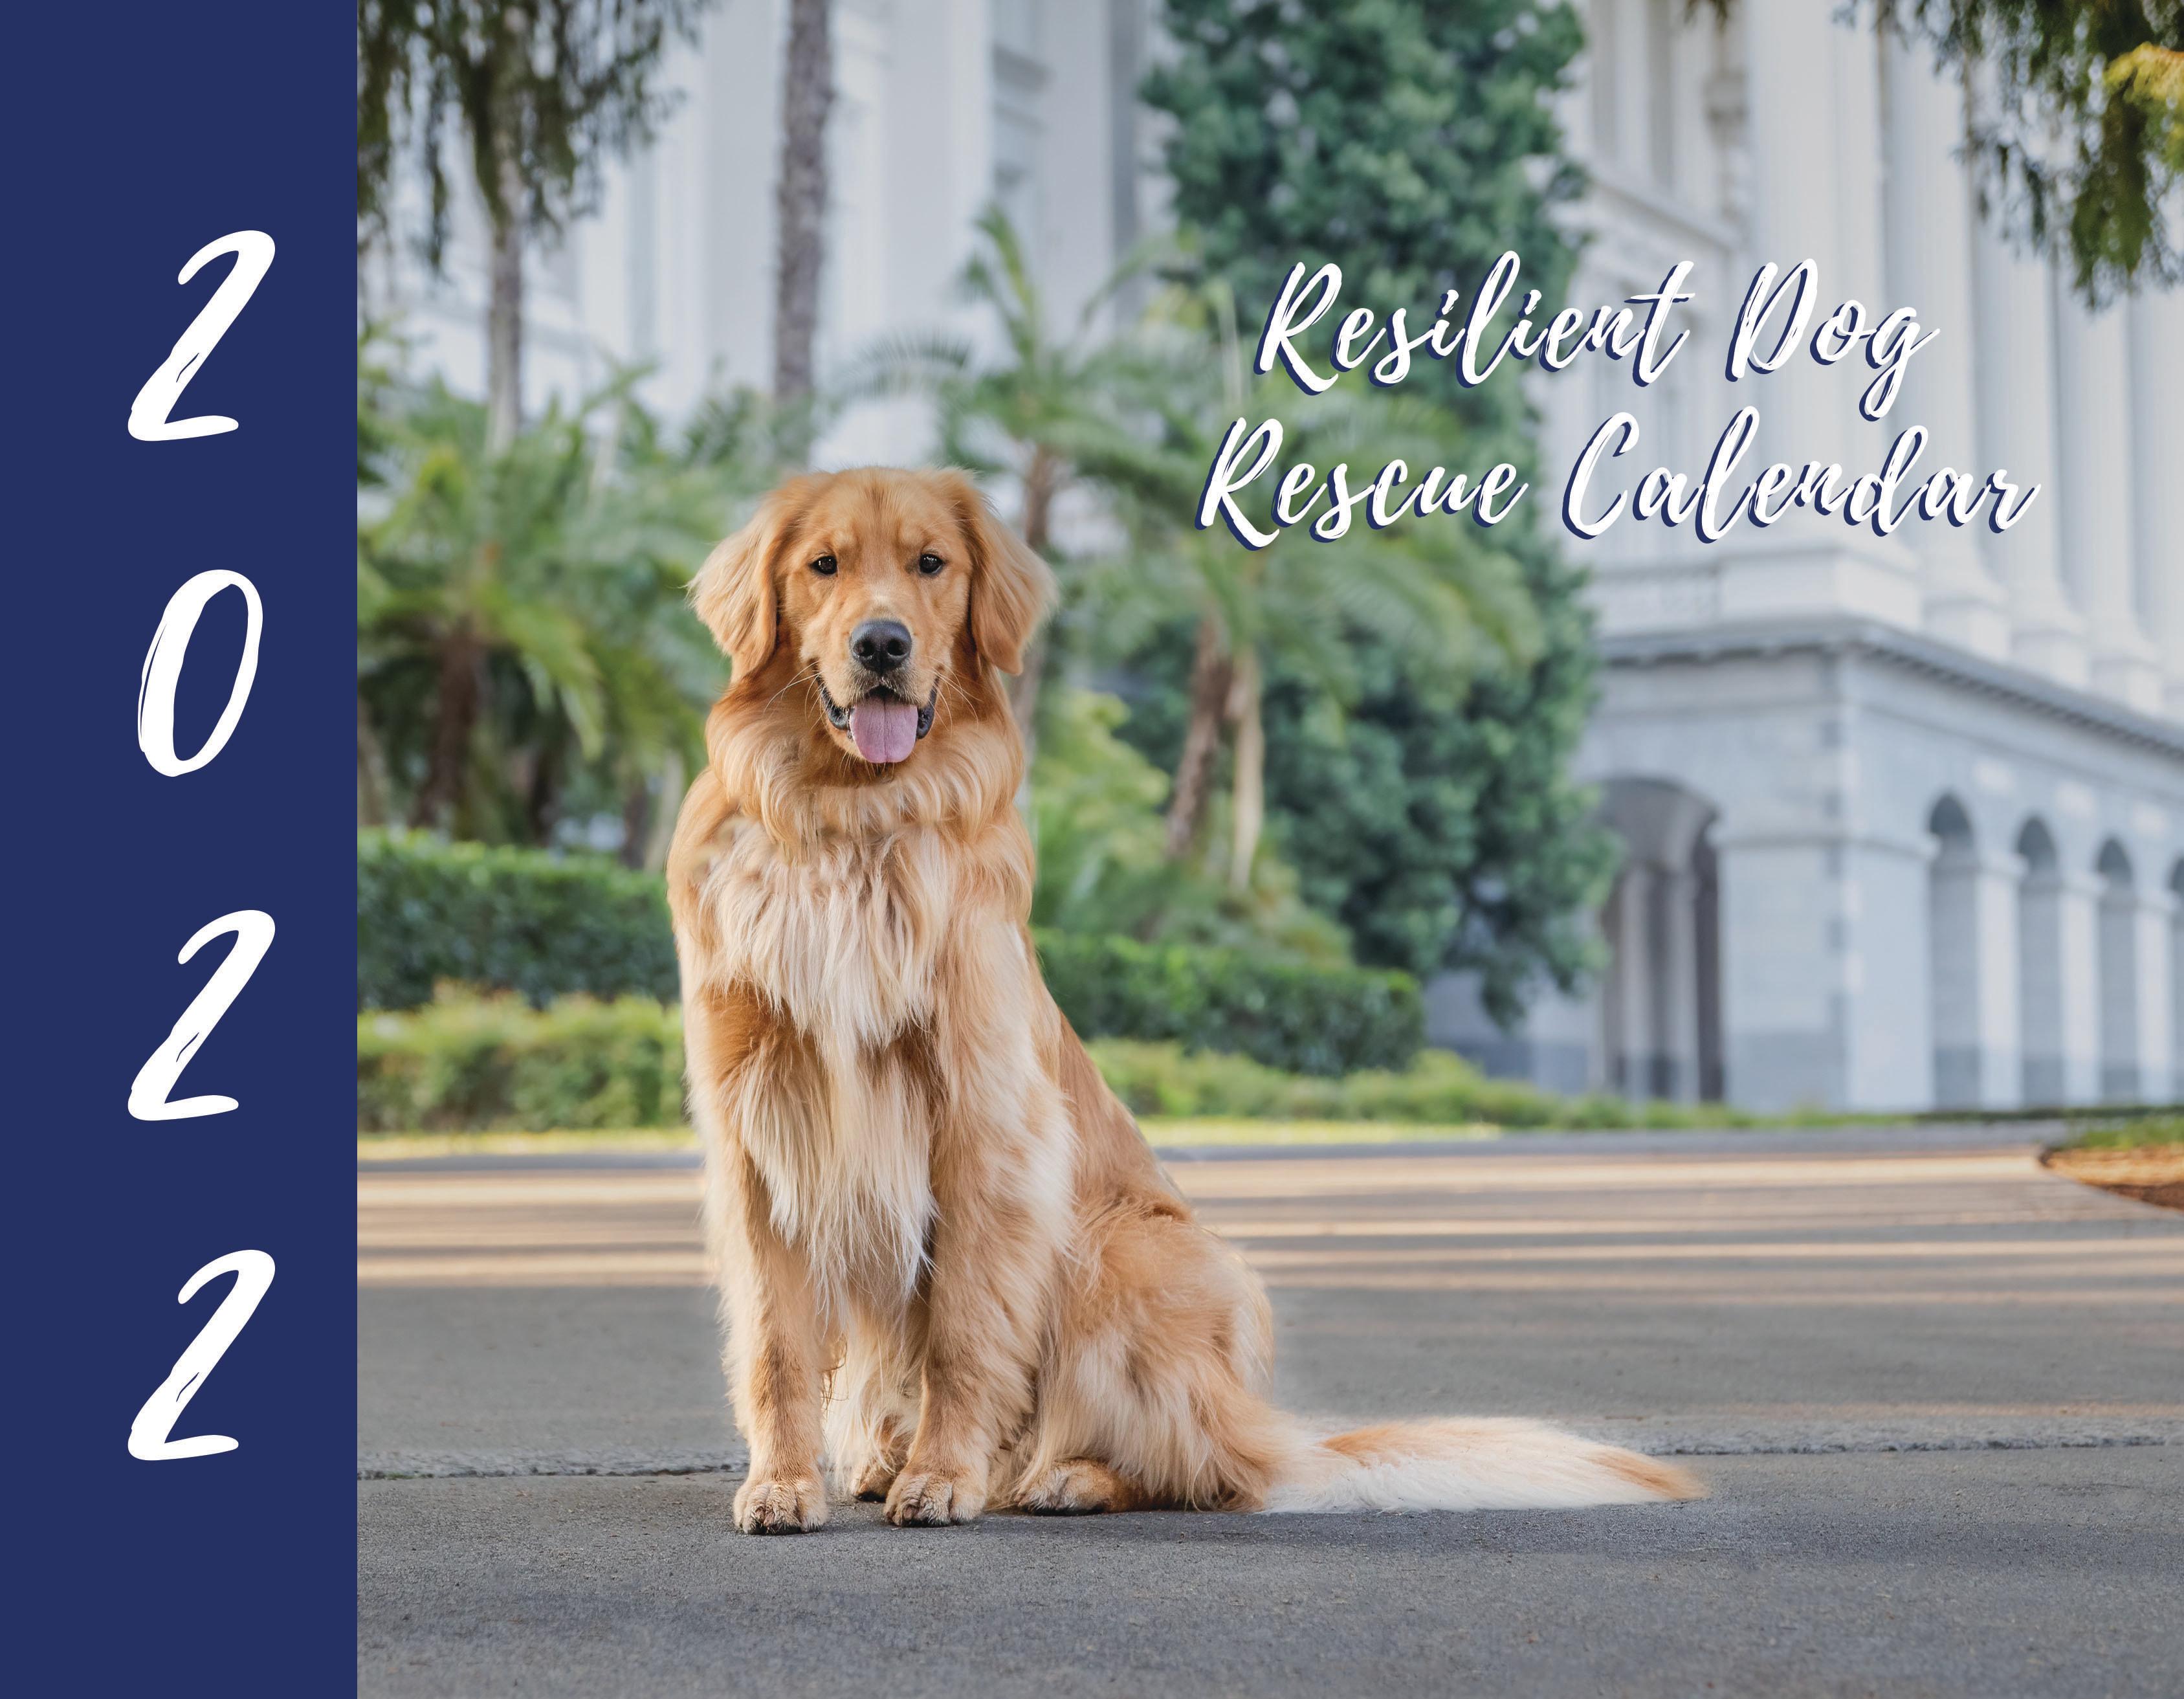 2022 Resilient Dog Rescue Calendar